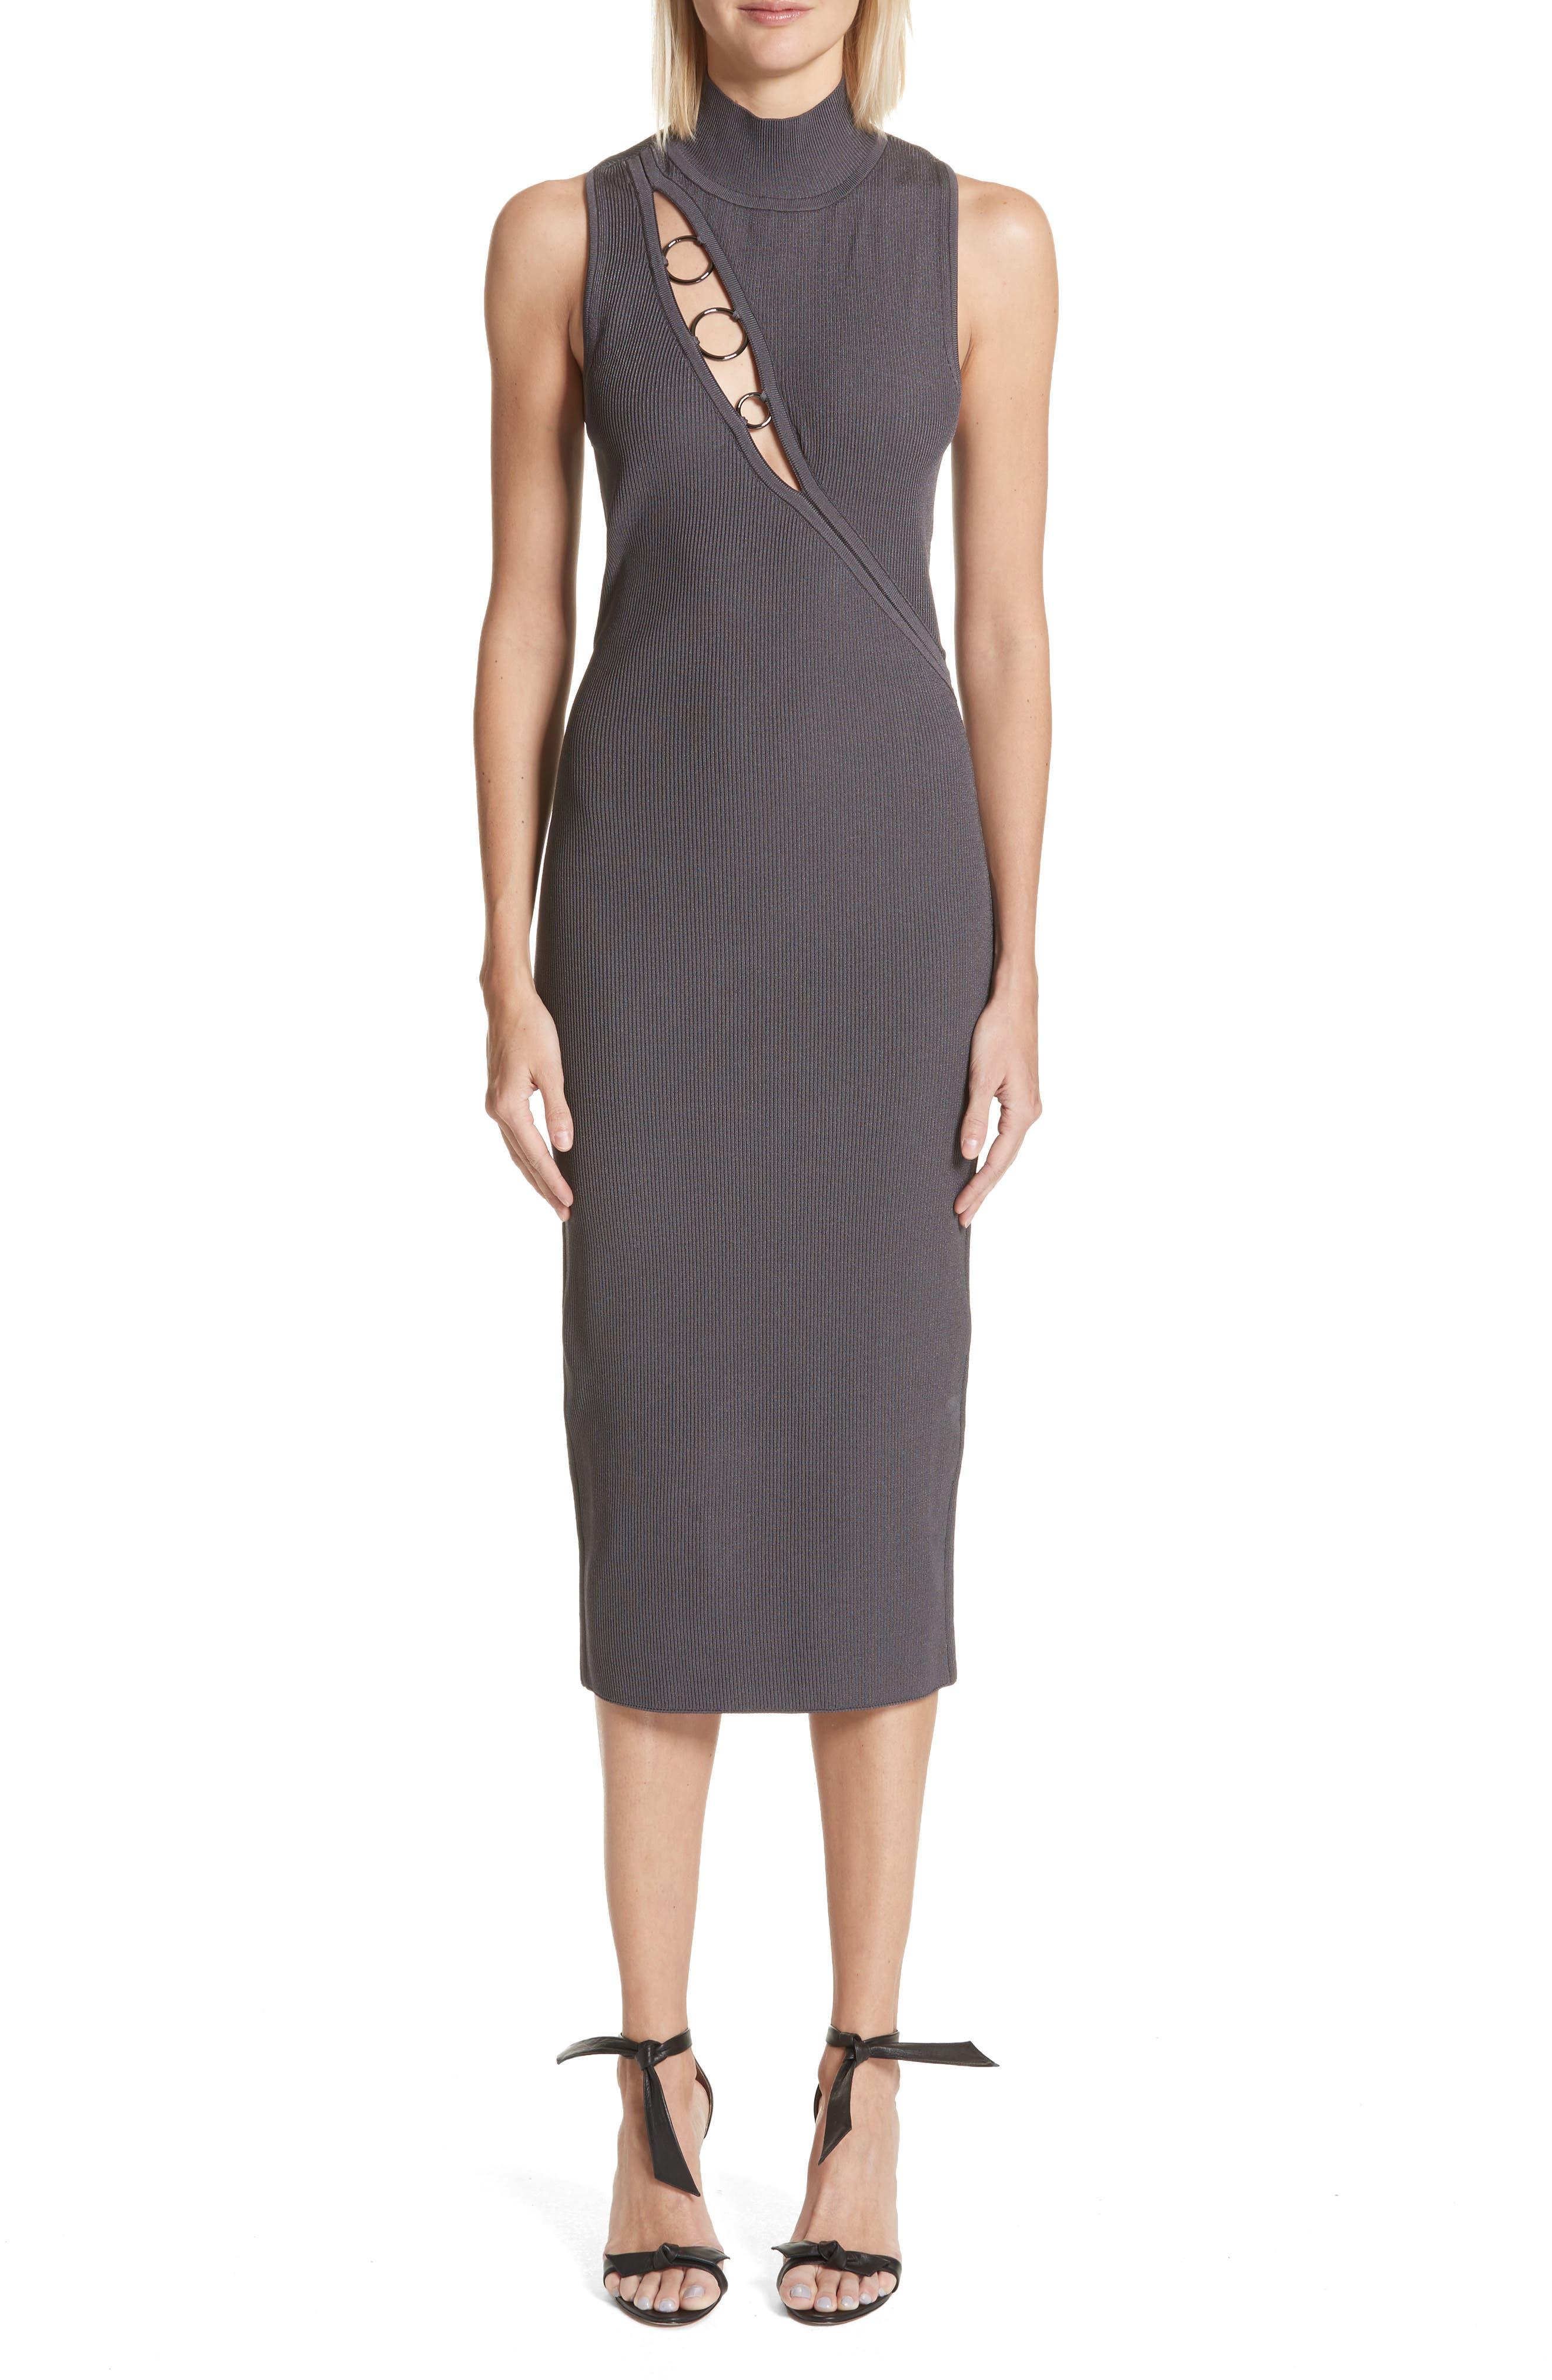 Alsia Cutout Knit Dress,                         Main,                         color, Graphite/ Gunmetal